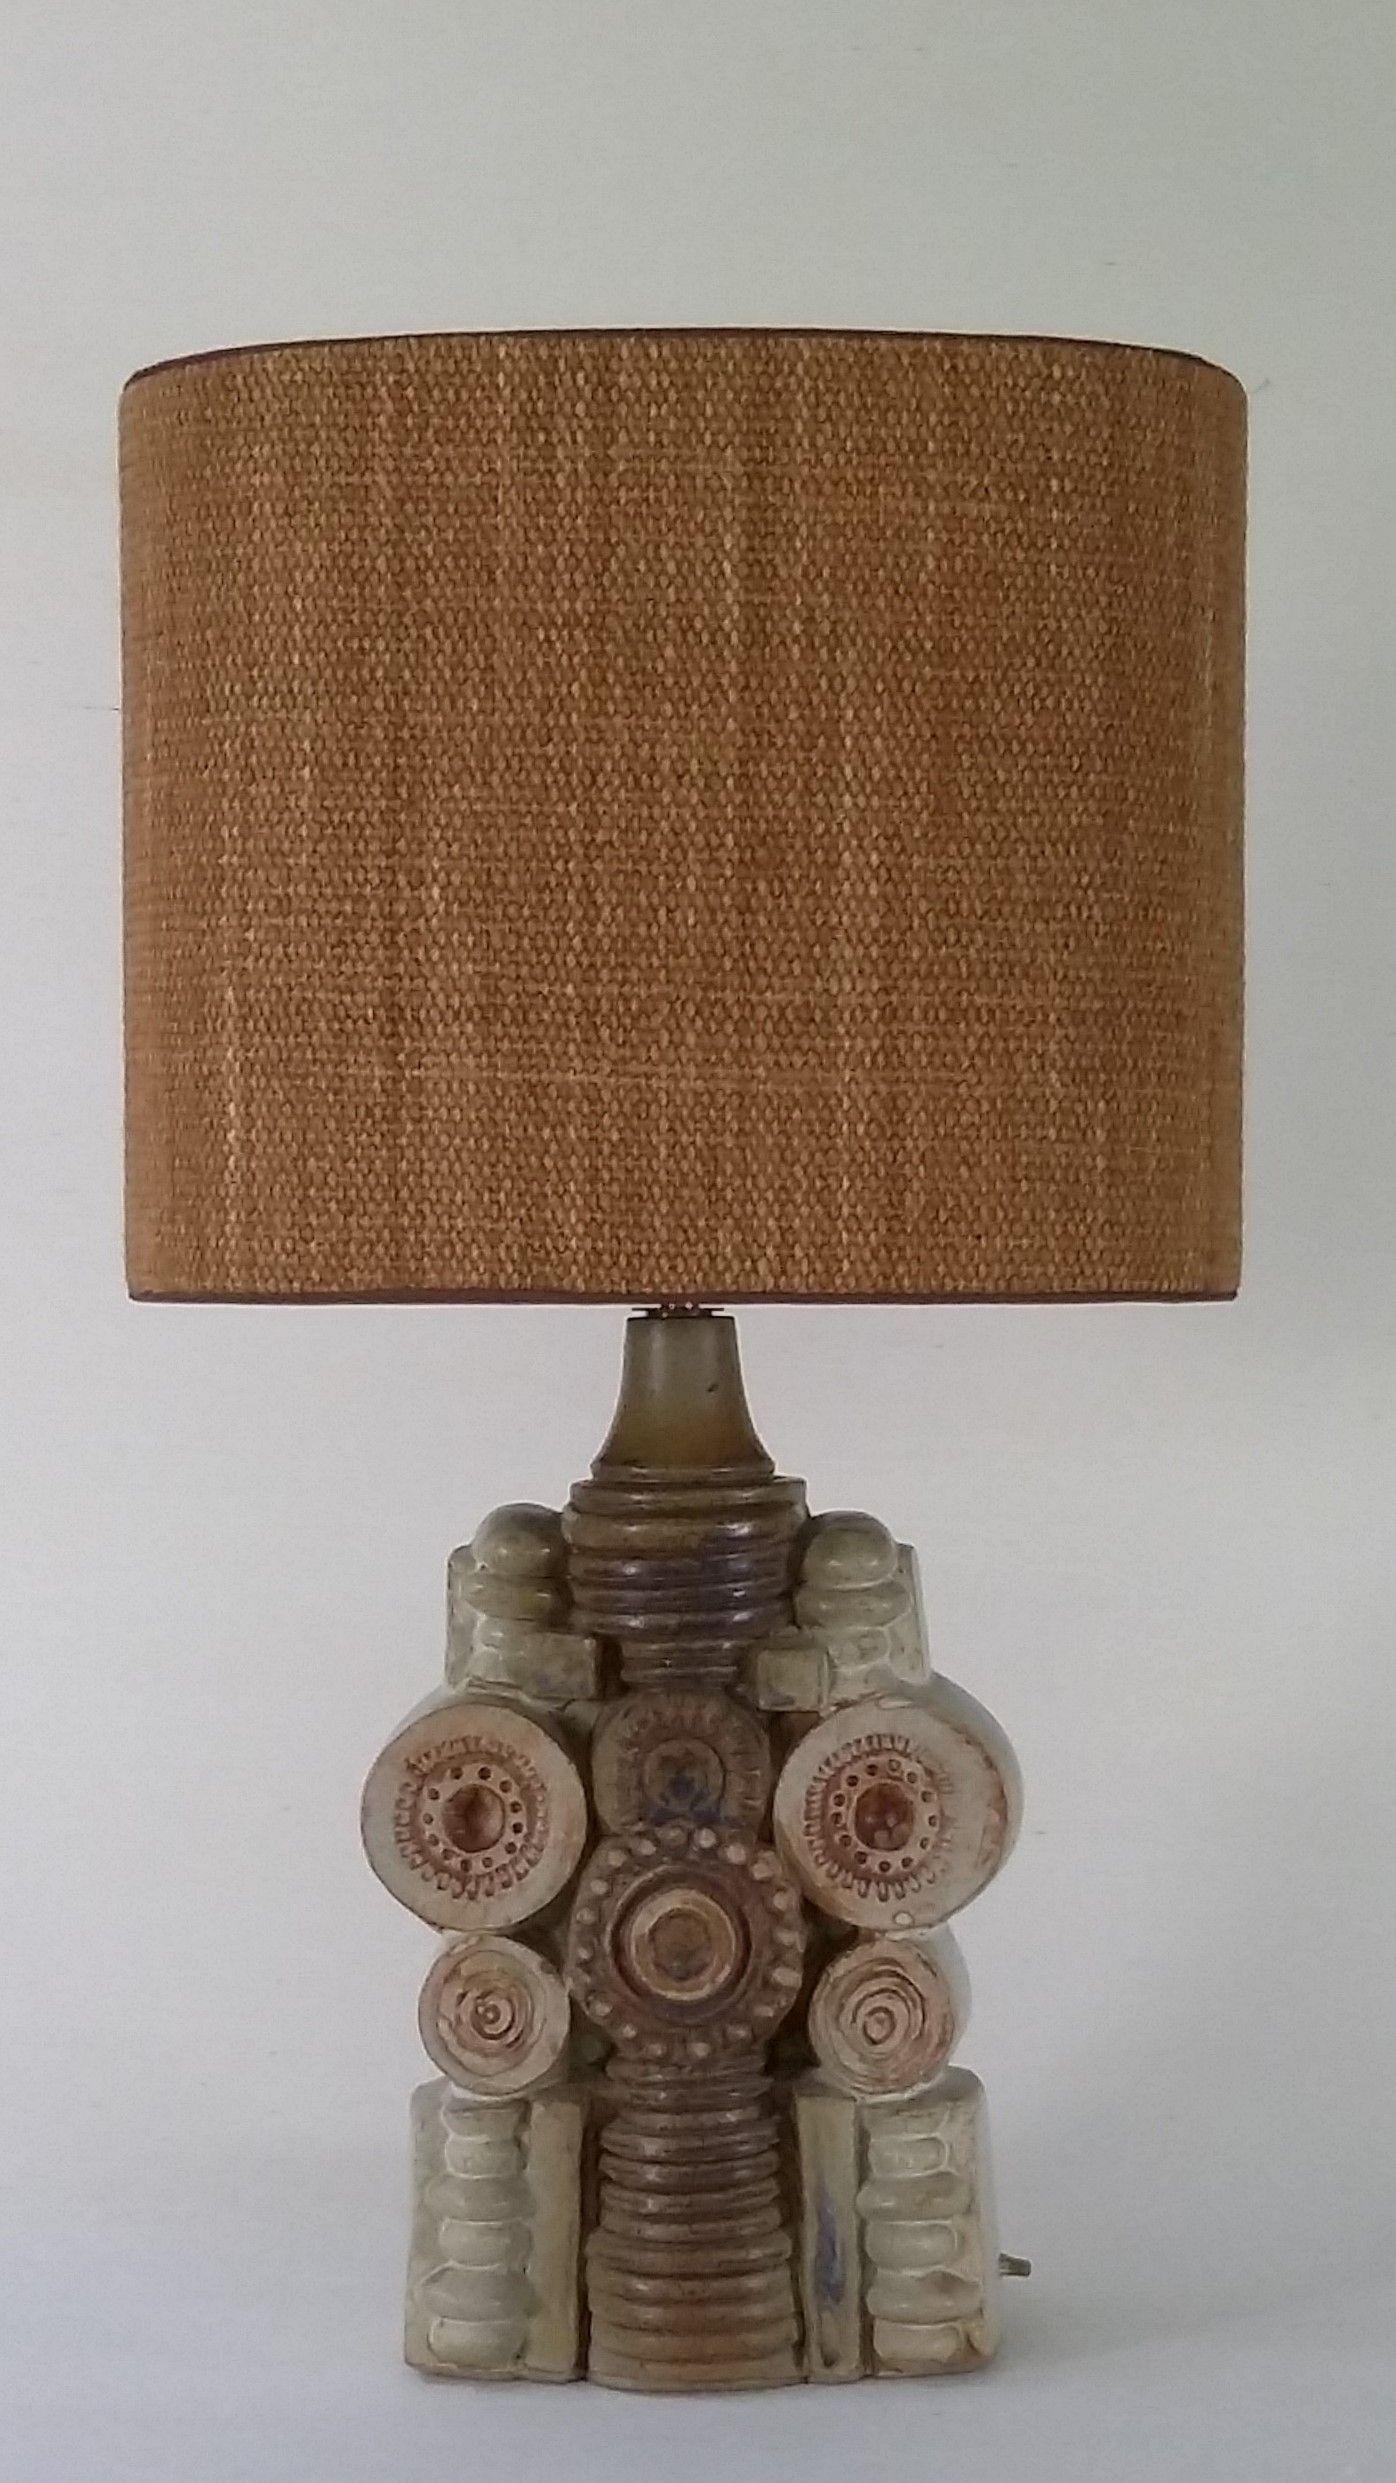 Vintage table lamp bernard rooke uk 1968 art pottery uk vintage table lamp bernard rooke uk 1968 aloadofball Image collections